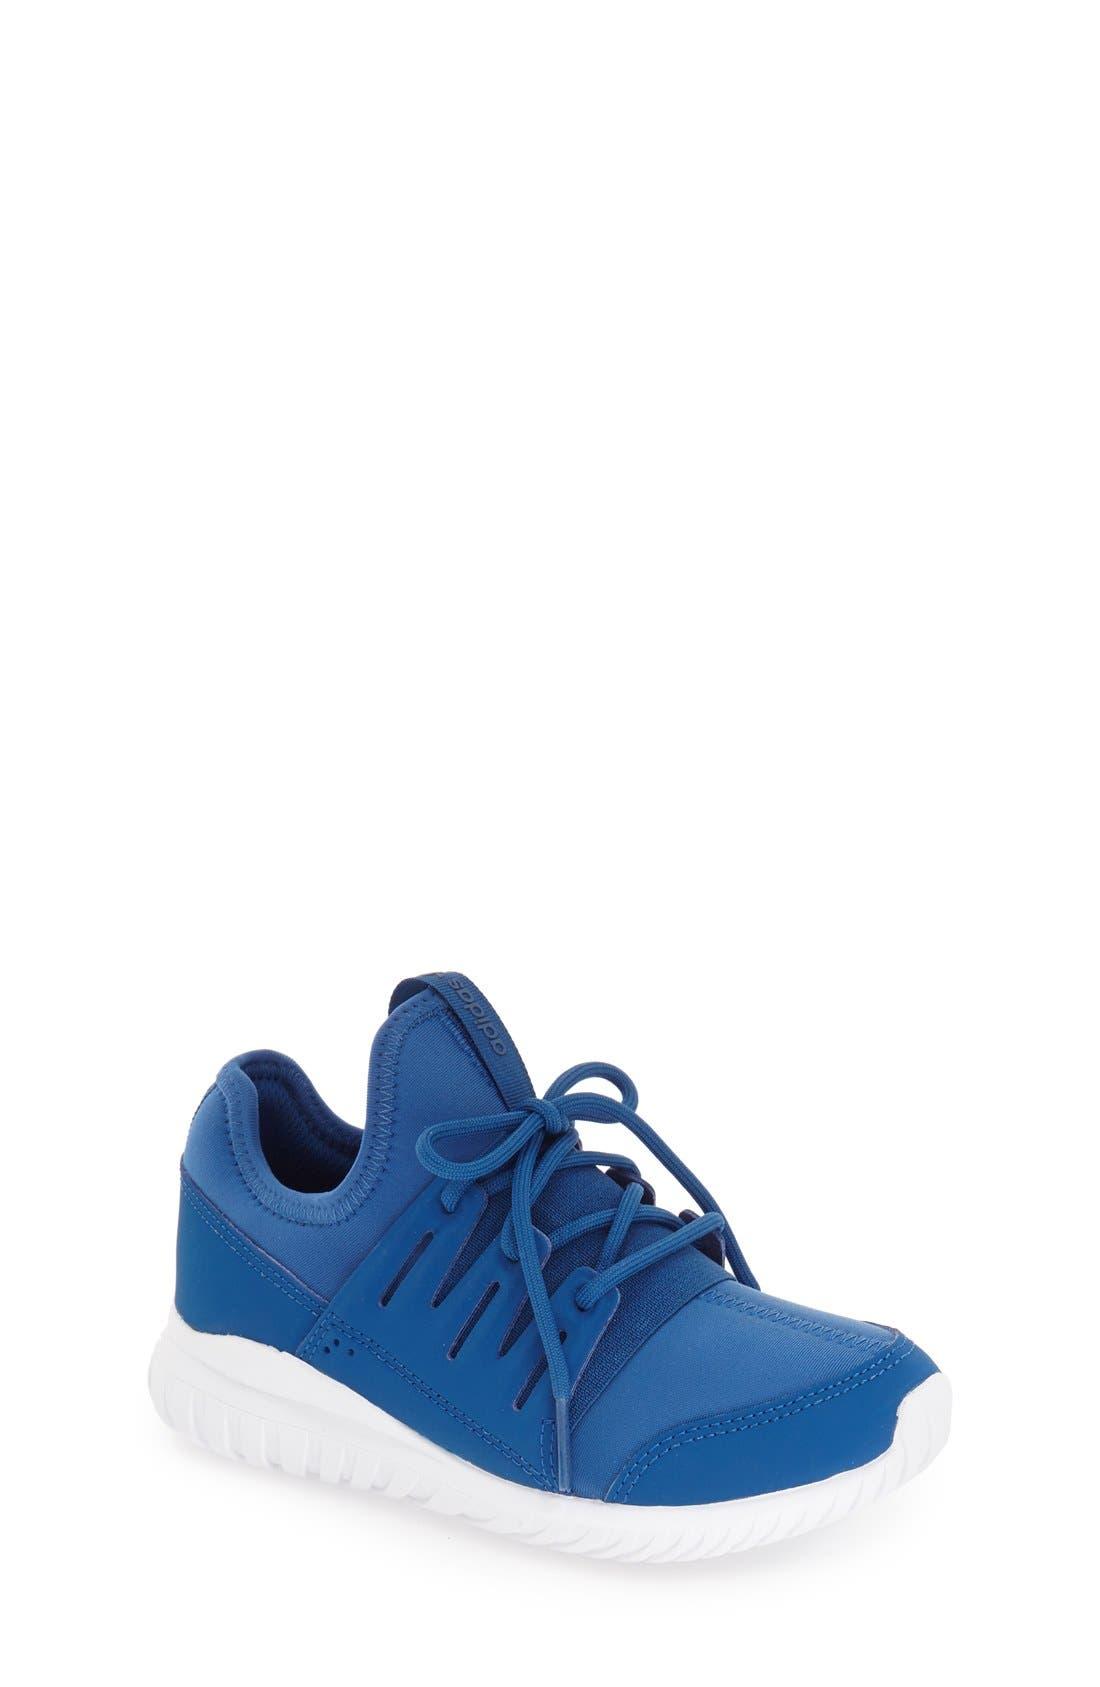 Alternate Image 1 Selected - adidas 'Tubular Radial K' Sneaker (Toddler, Little Kid & Big Kid)